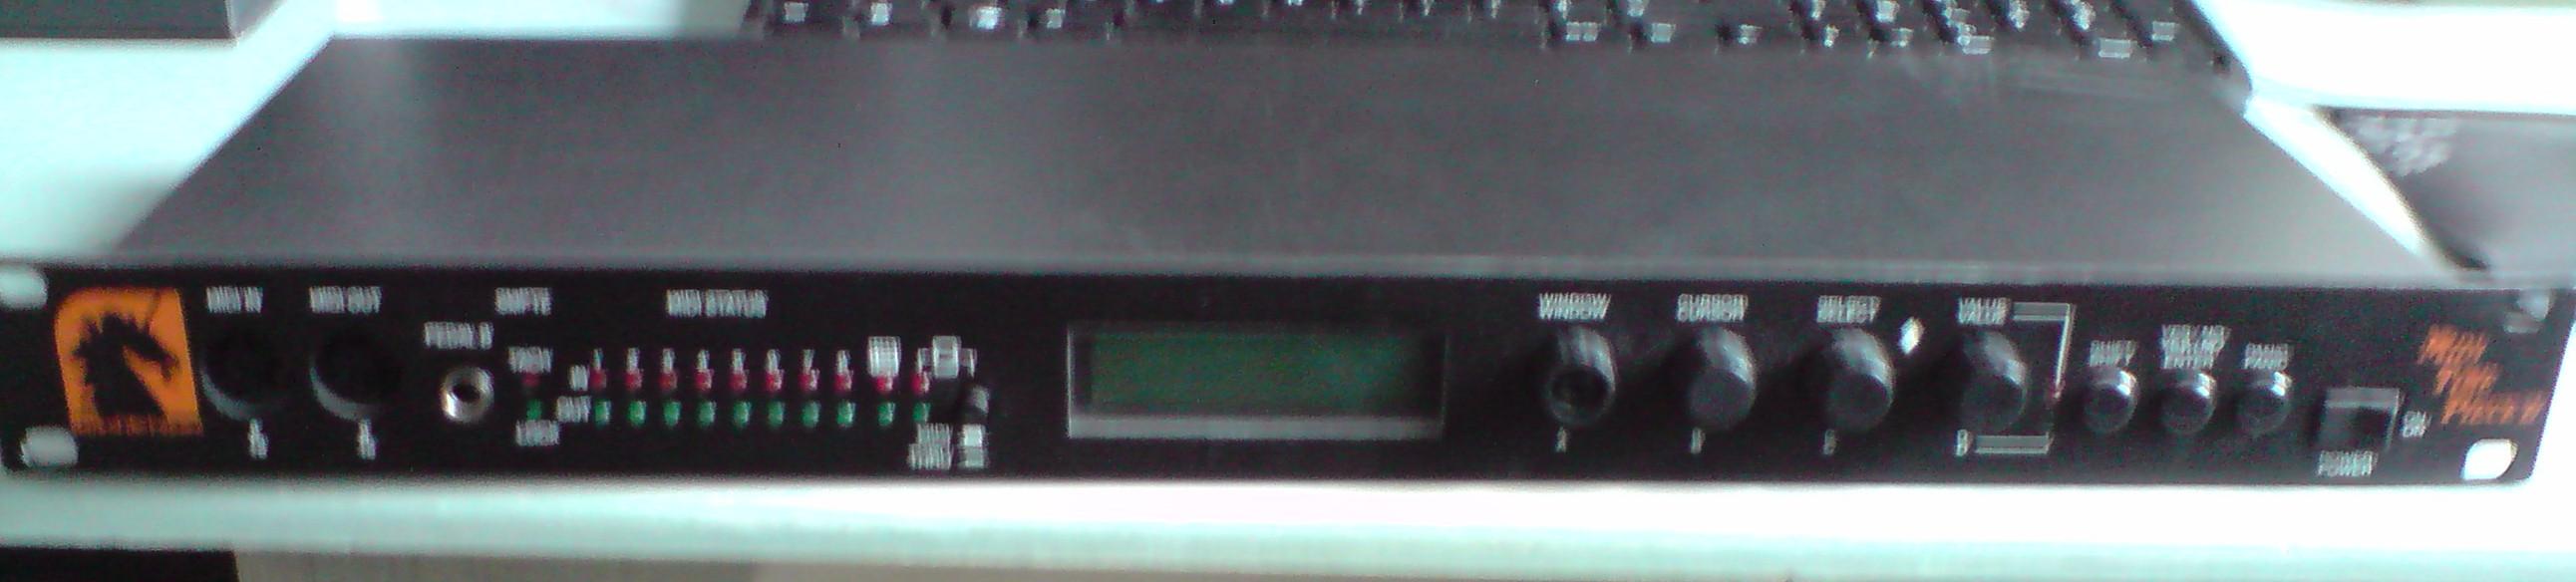 motu midi timepiece ii image 1158346 audiofanzine rh en audiofanzine com Motu M-TP MOTU Digital Timepiece